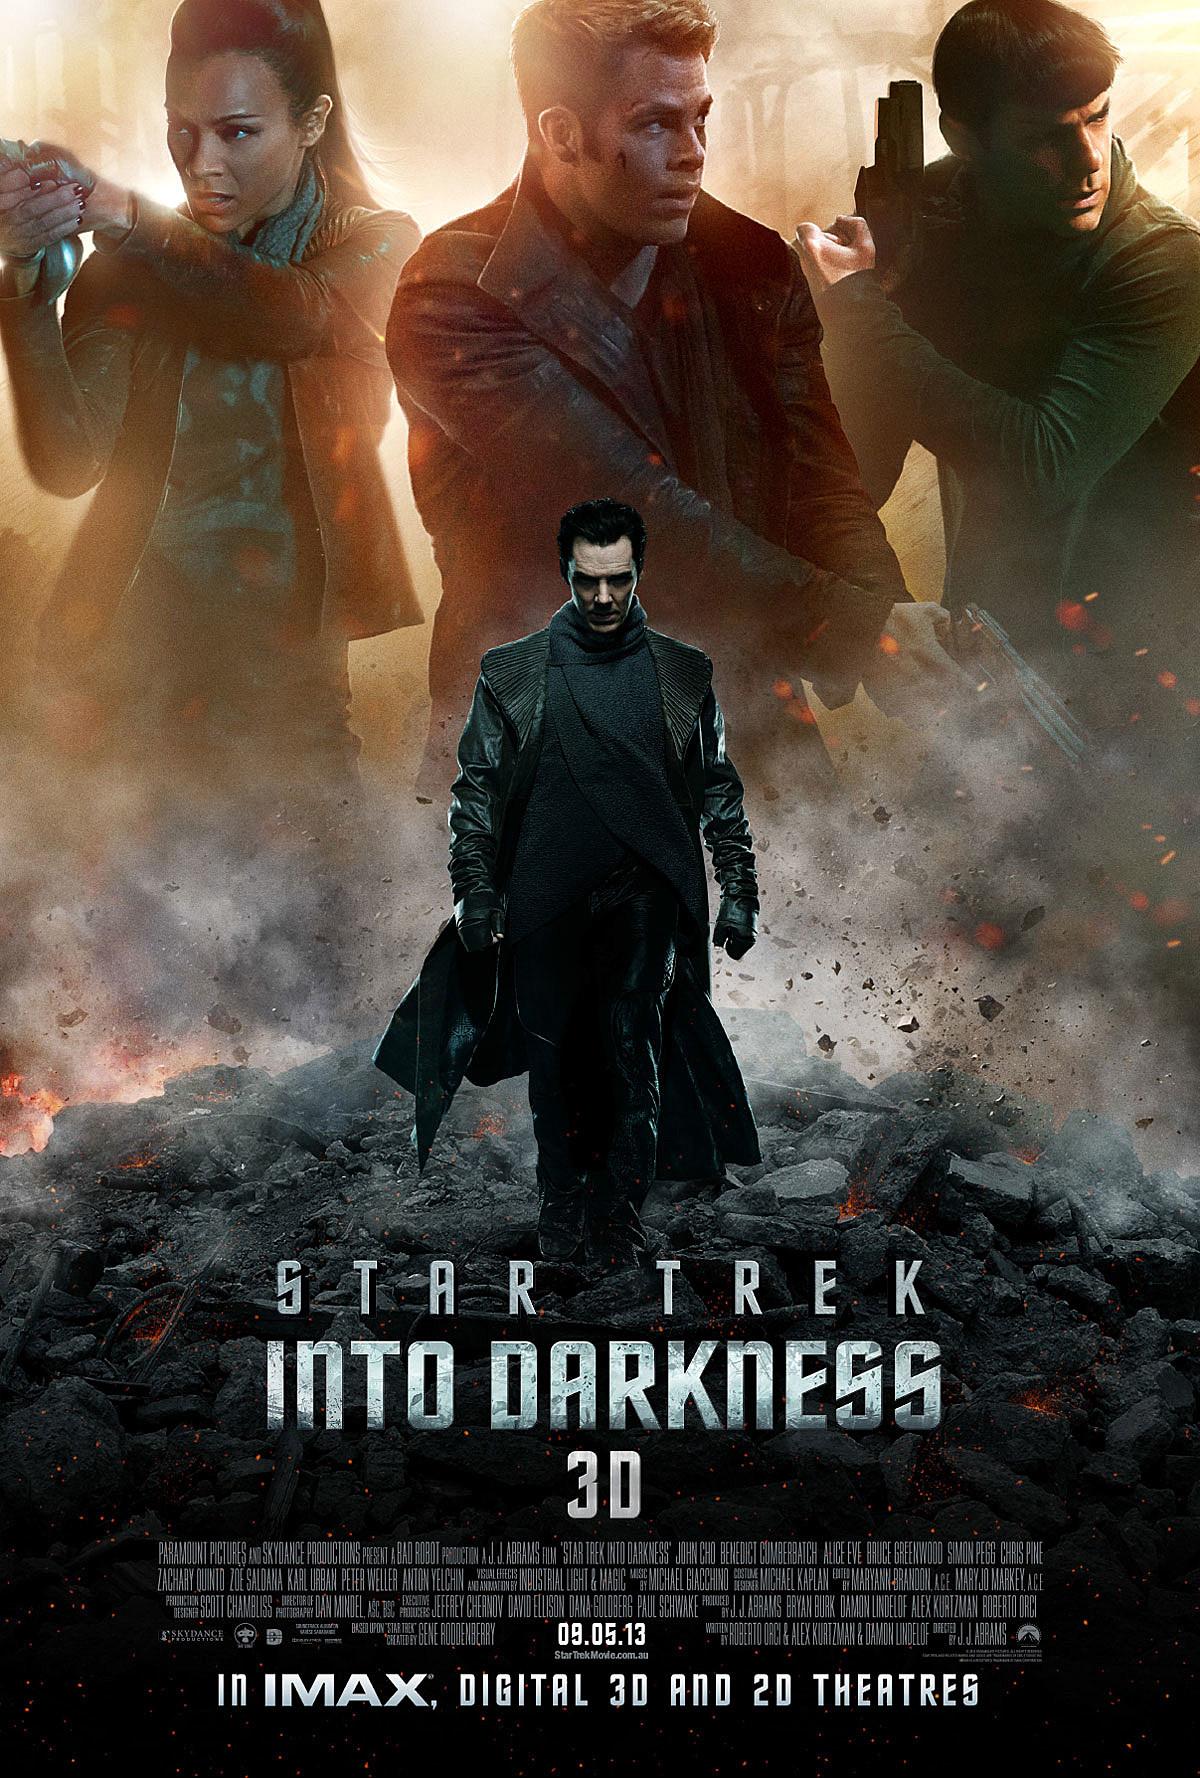 Star Trek Into Moral Leadership - 438.1KB